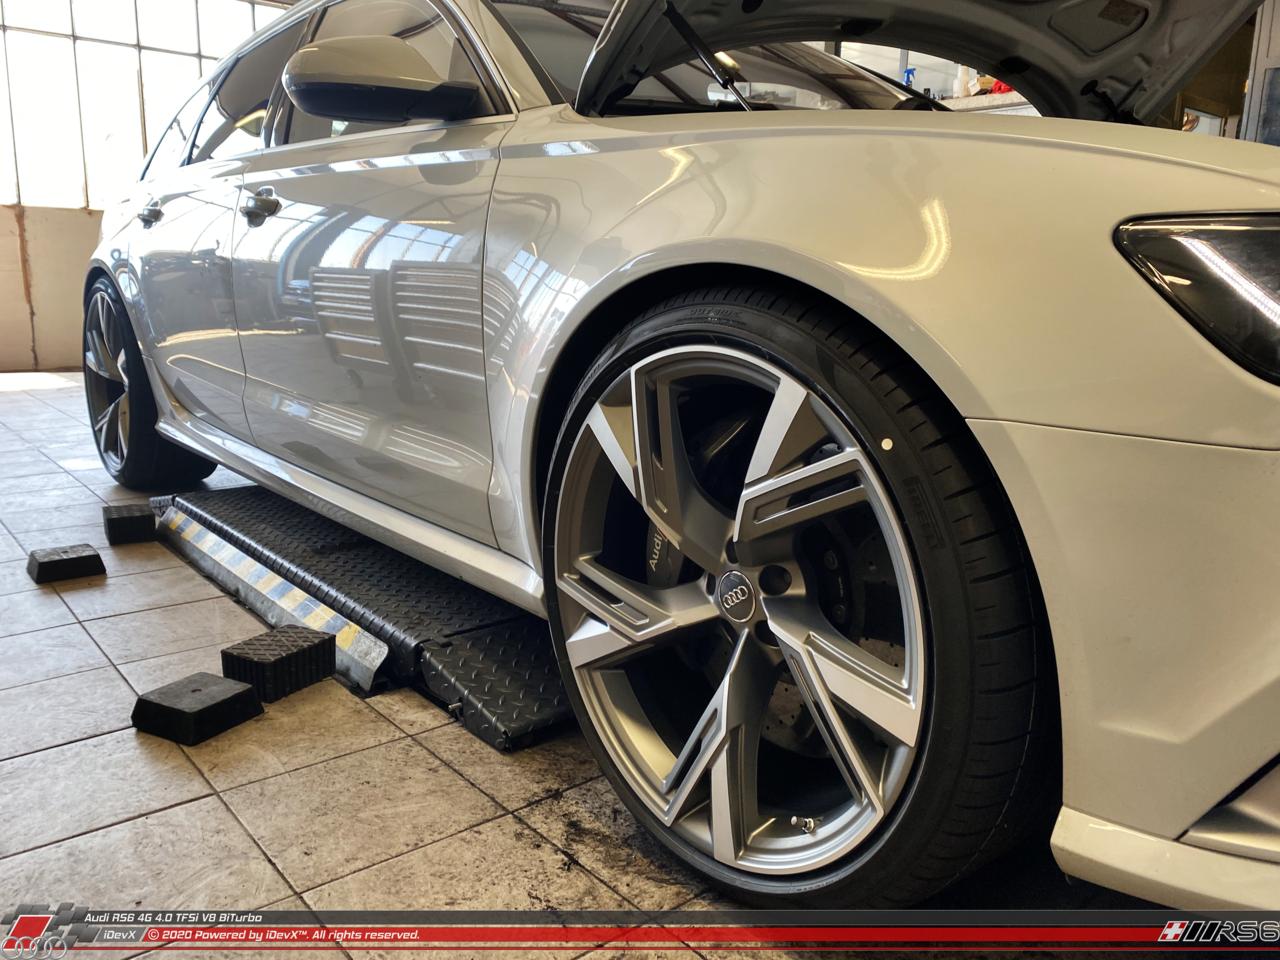 18.03.2020_Audi-RS6_iDevX_005.png